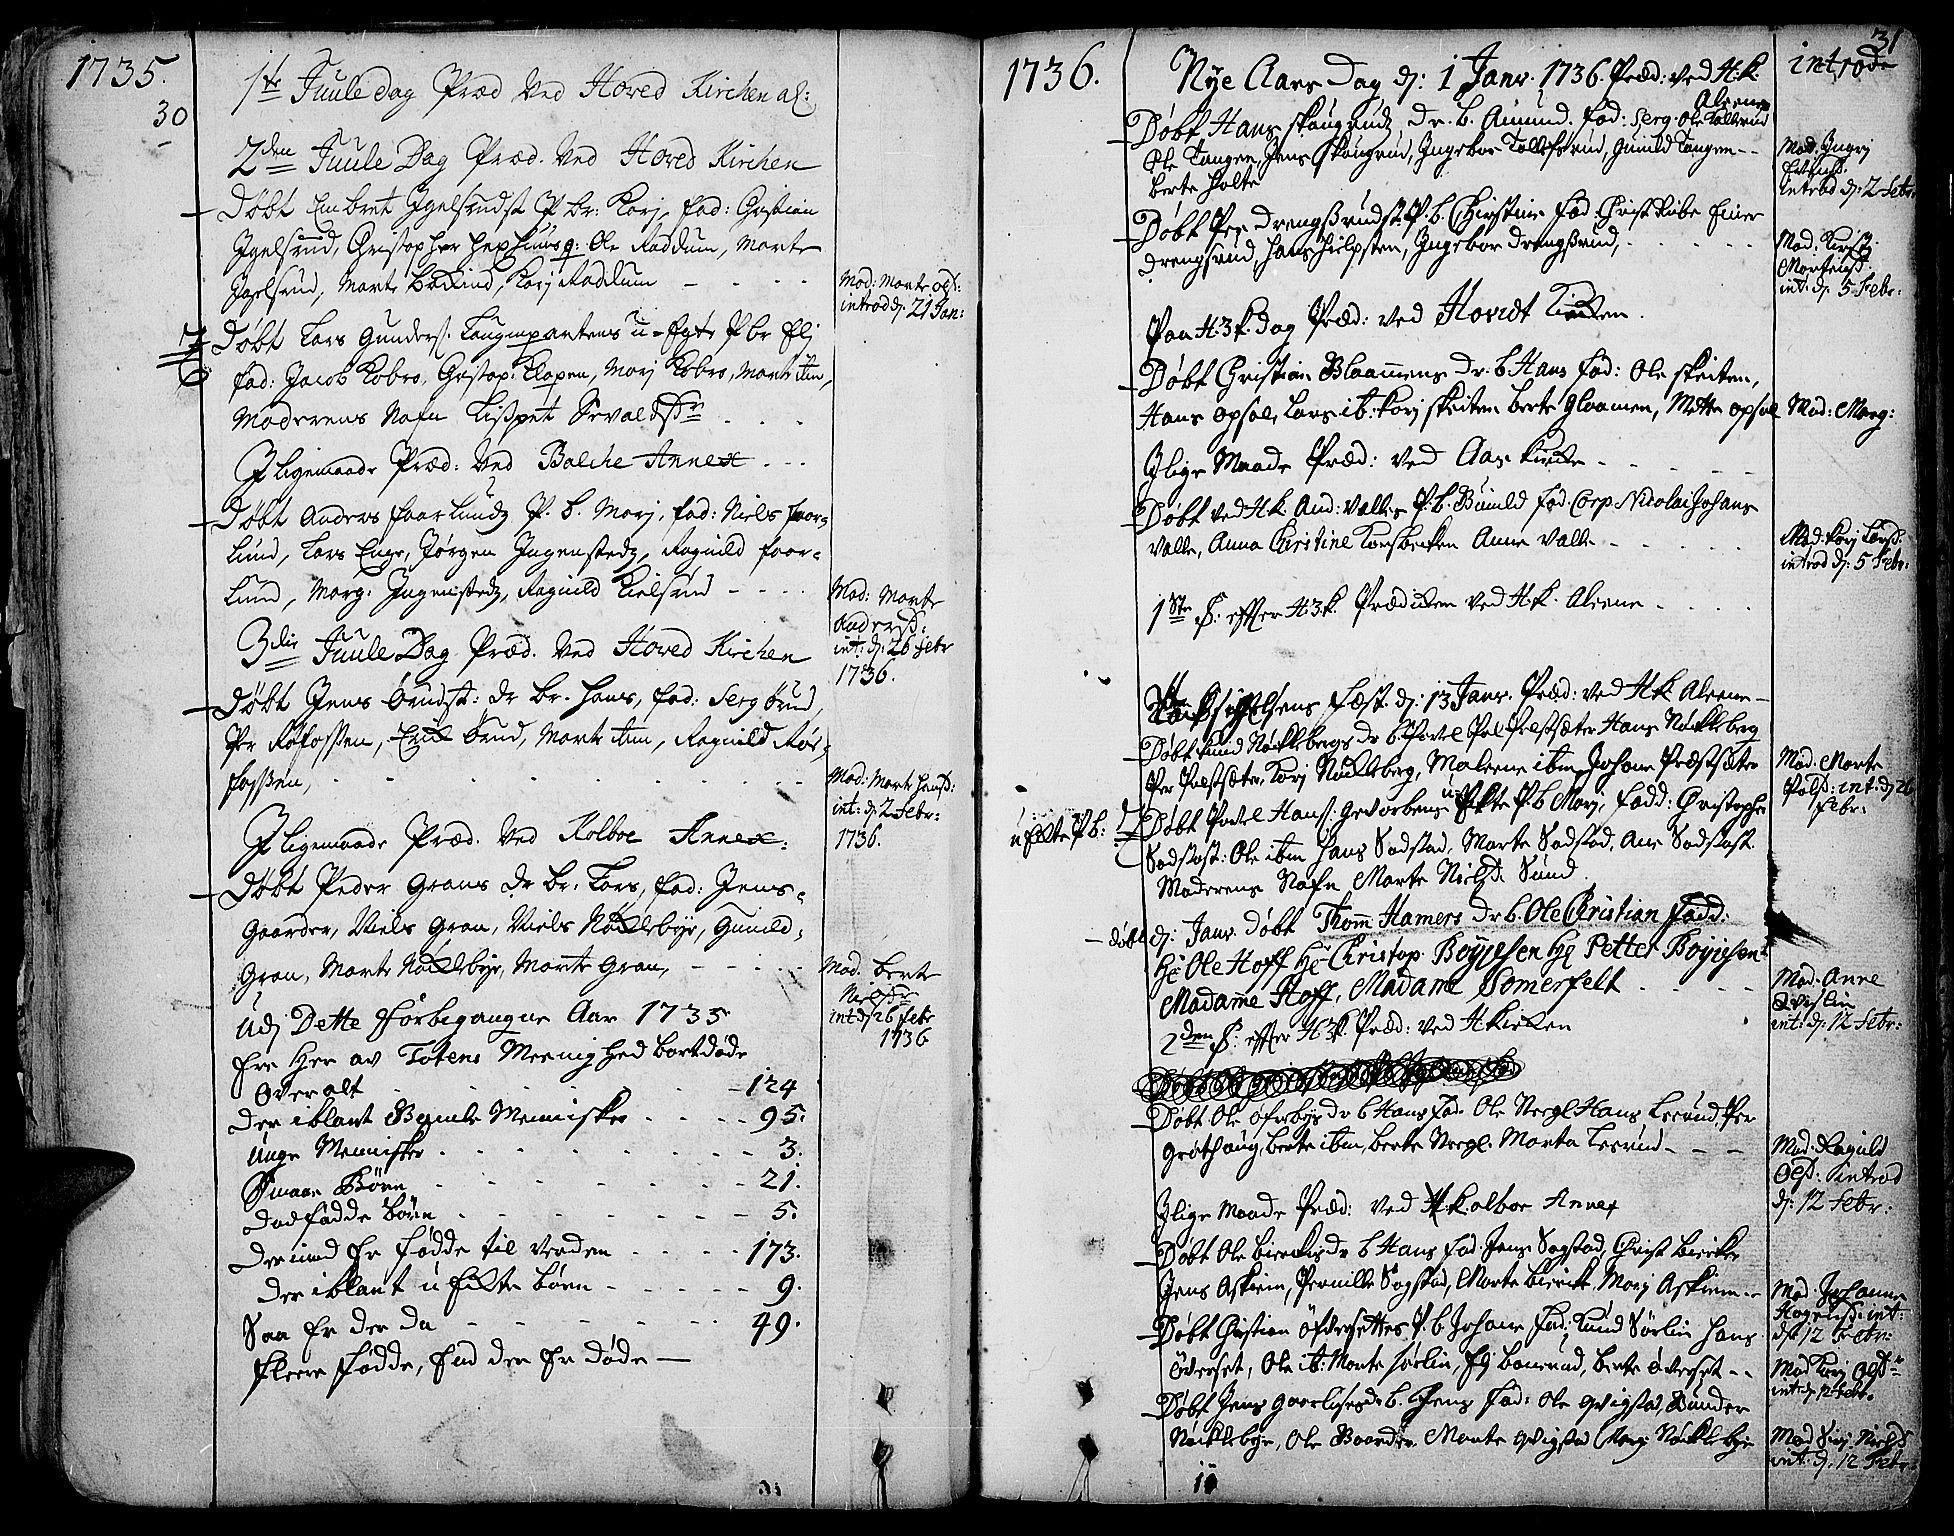 SAH, Toten prestekontor, Ministerialbok nr. 3, 1734-1751, s. 30-31